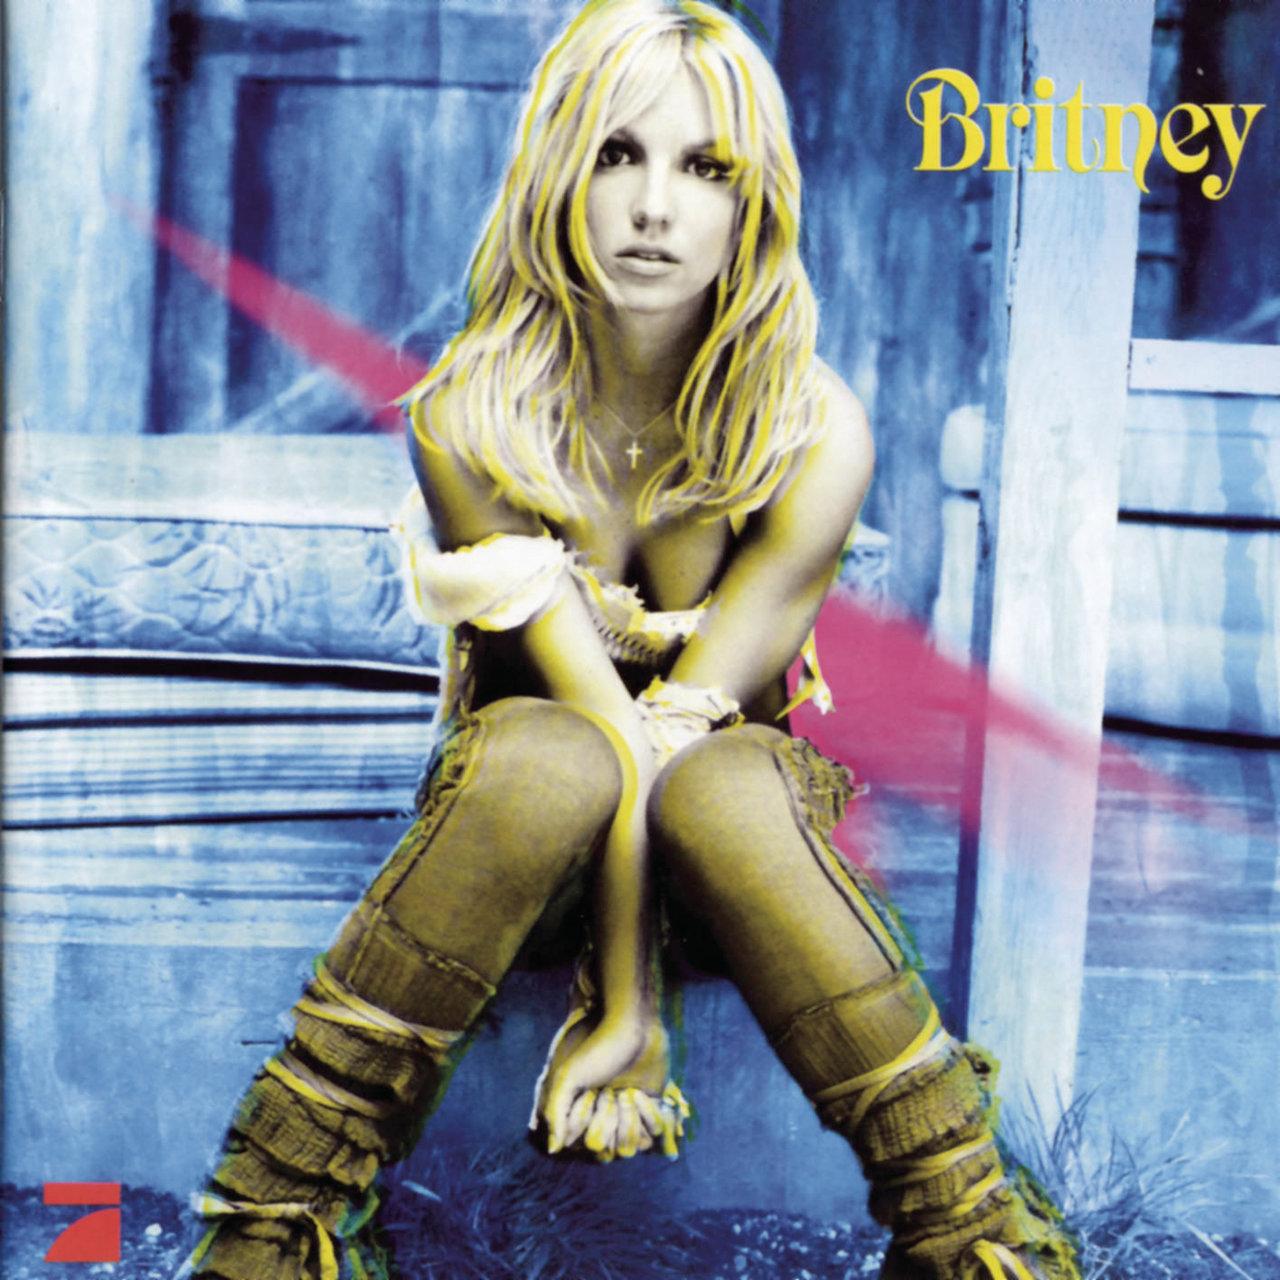 【FLAC/Album】Britney Spears – Britney (Digital Deluxe Version)插图